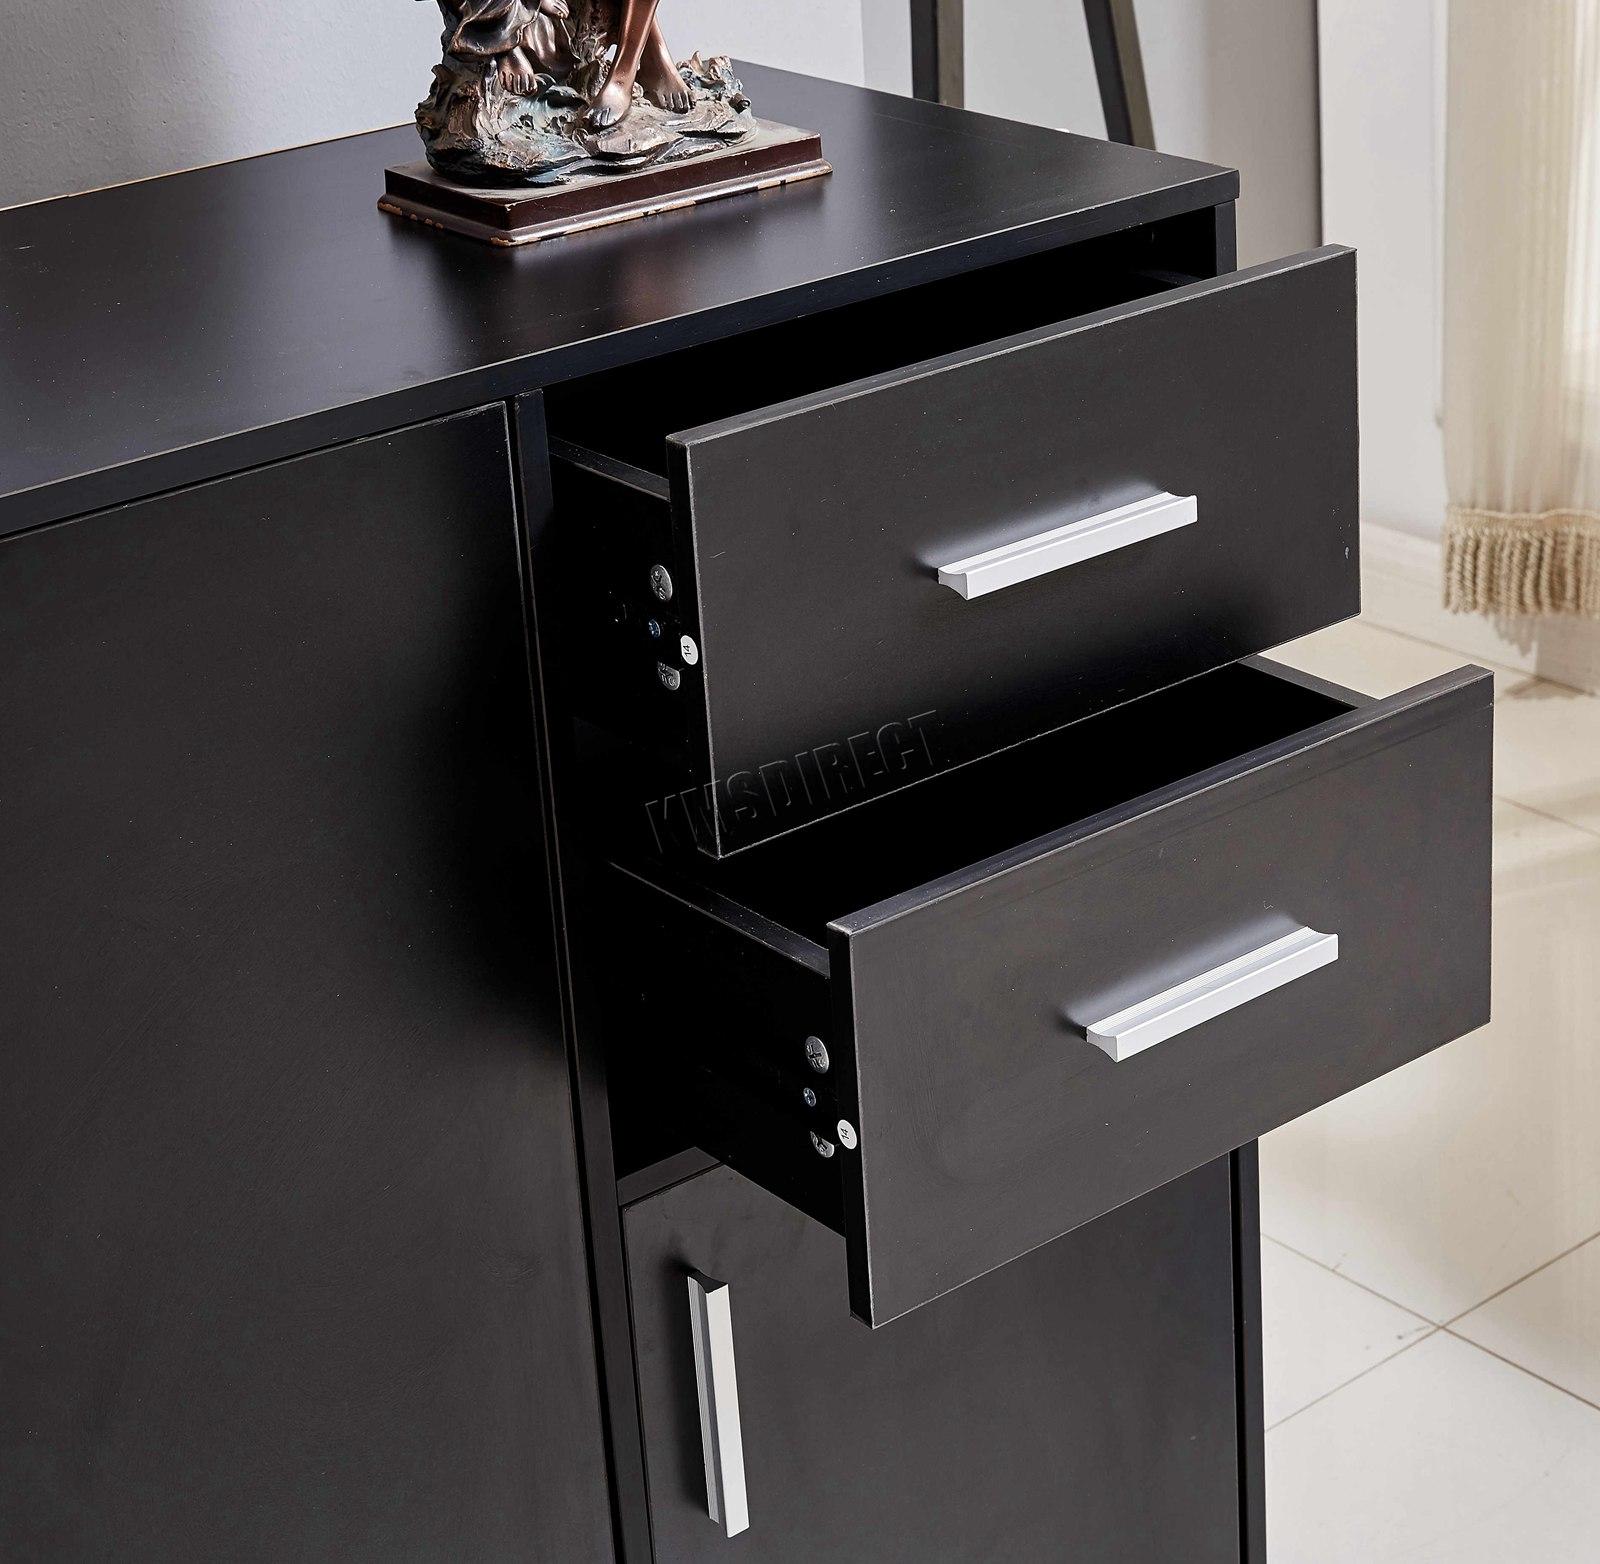 WestWood-Sideboard-Cabinet-Storage-tableware-Kitchen-Cupboard-Unit-PB-SSP01-NEW thumbnail 29